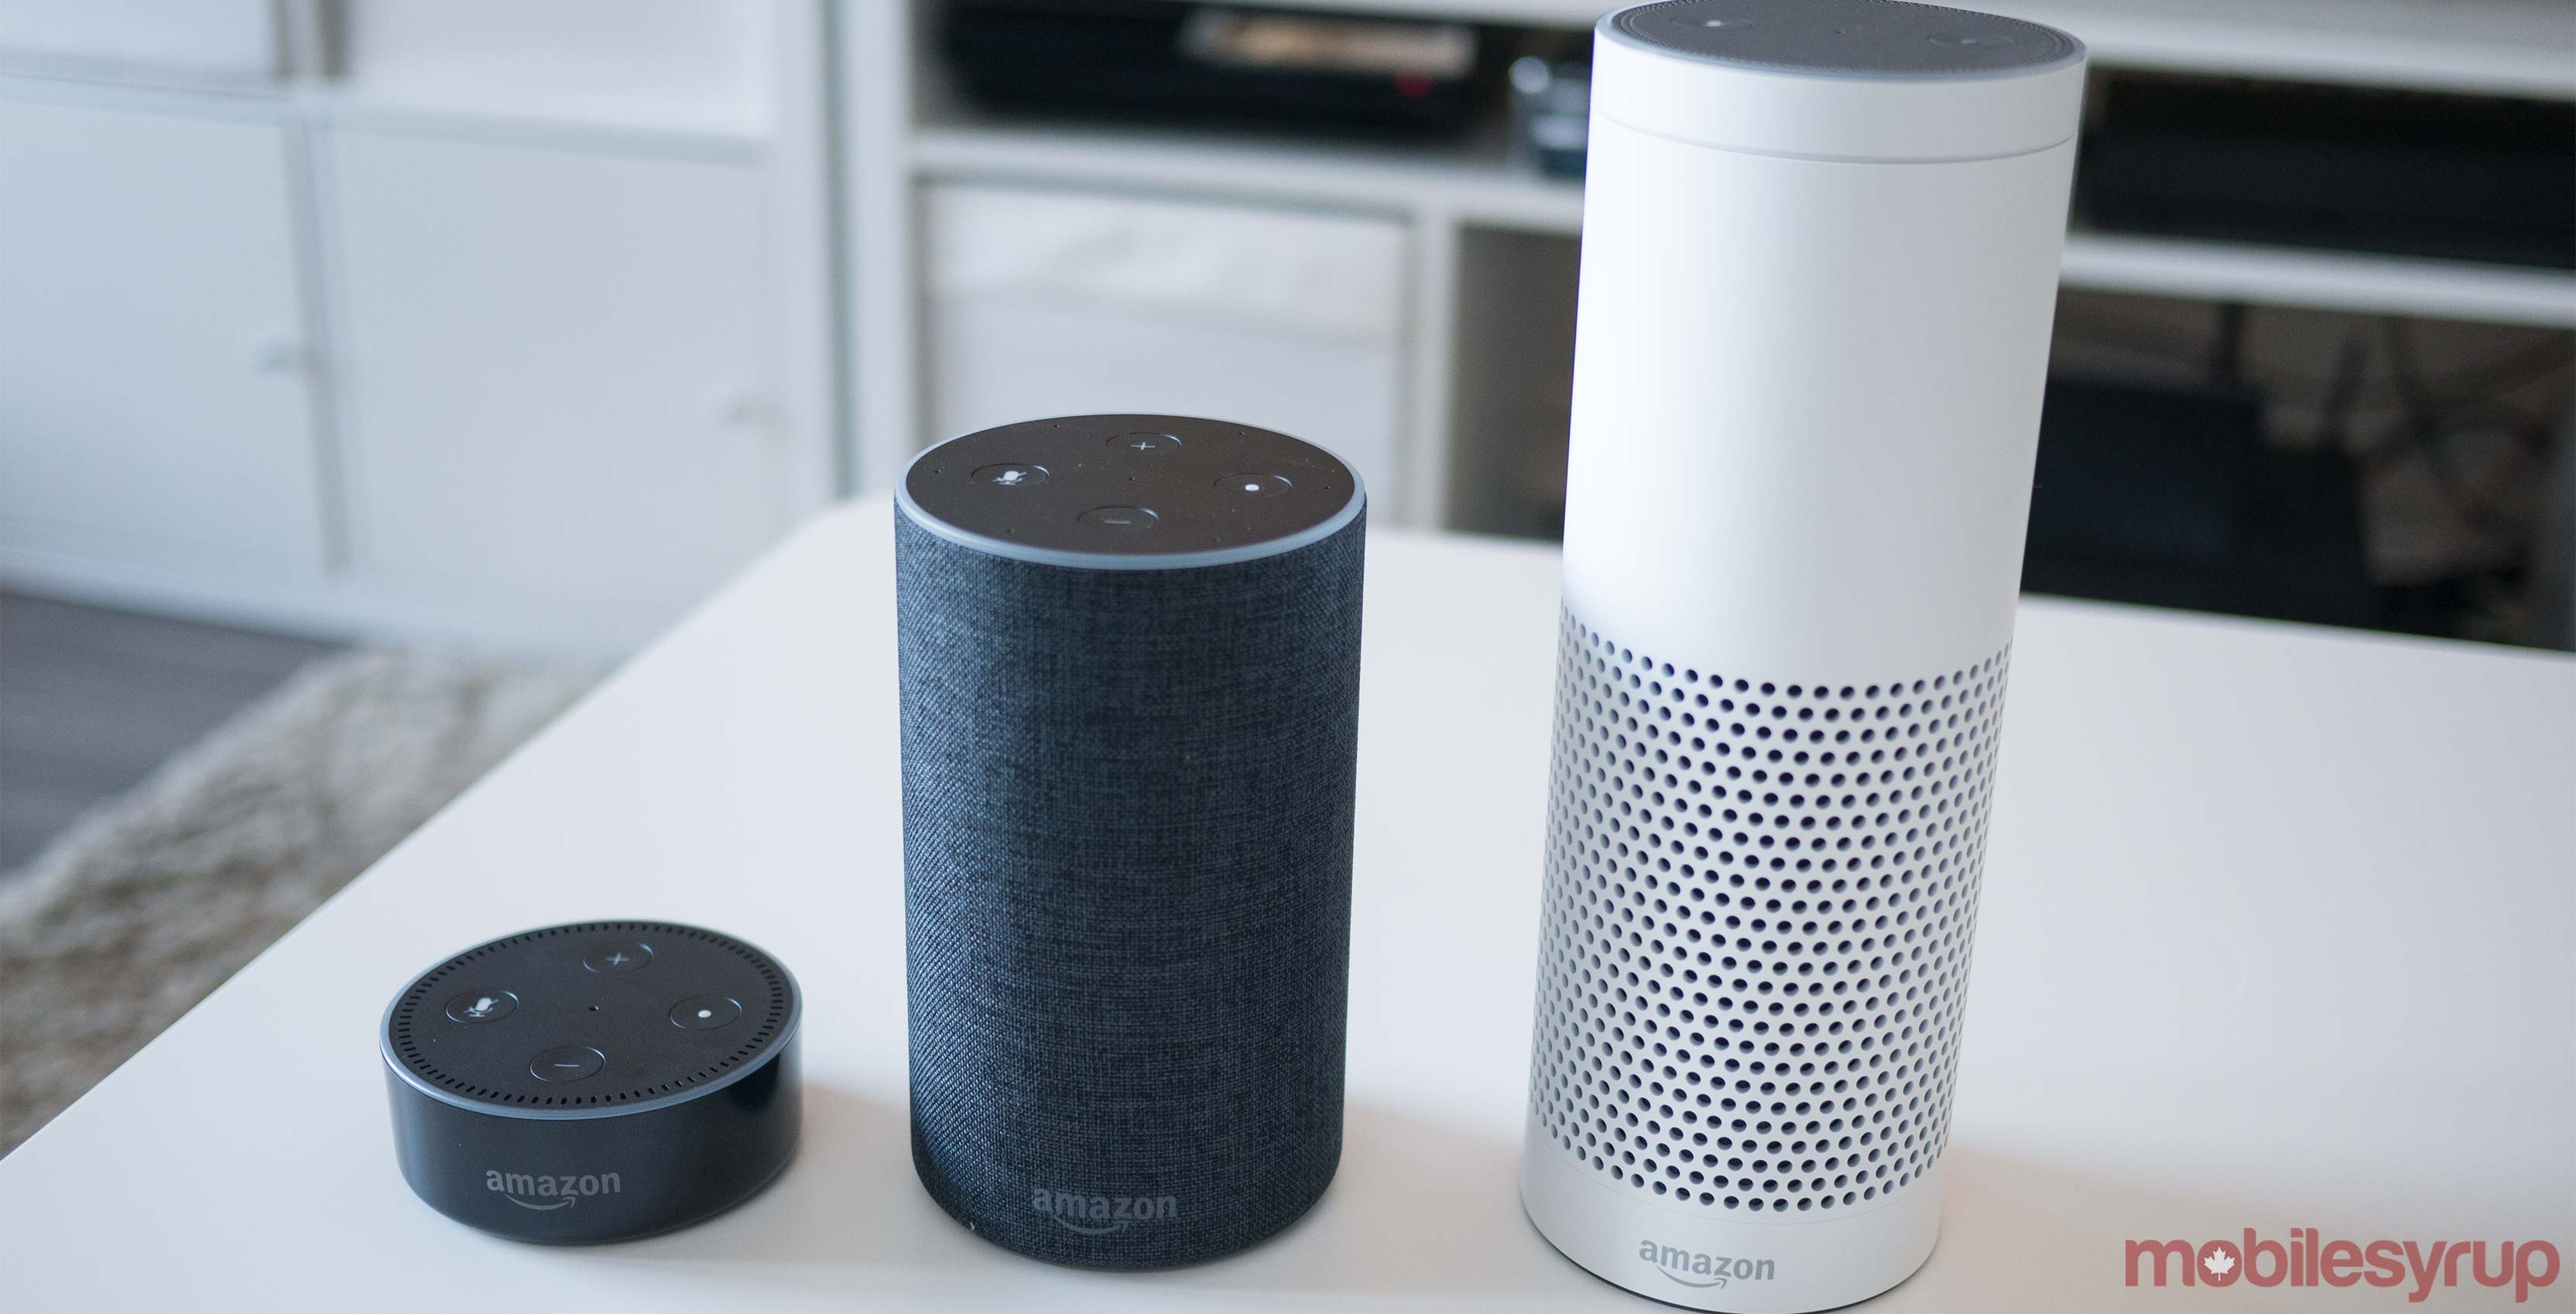 Amazon Echo Canadian devices